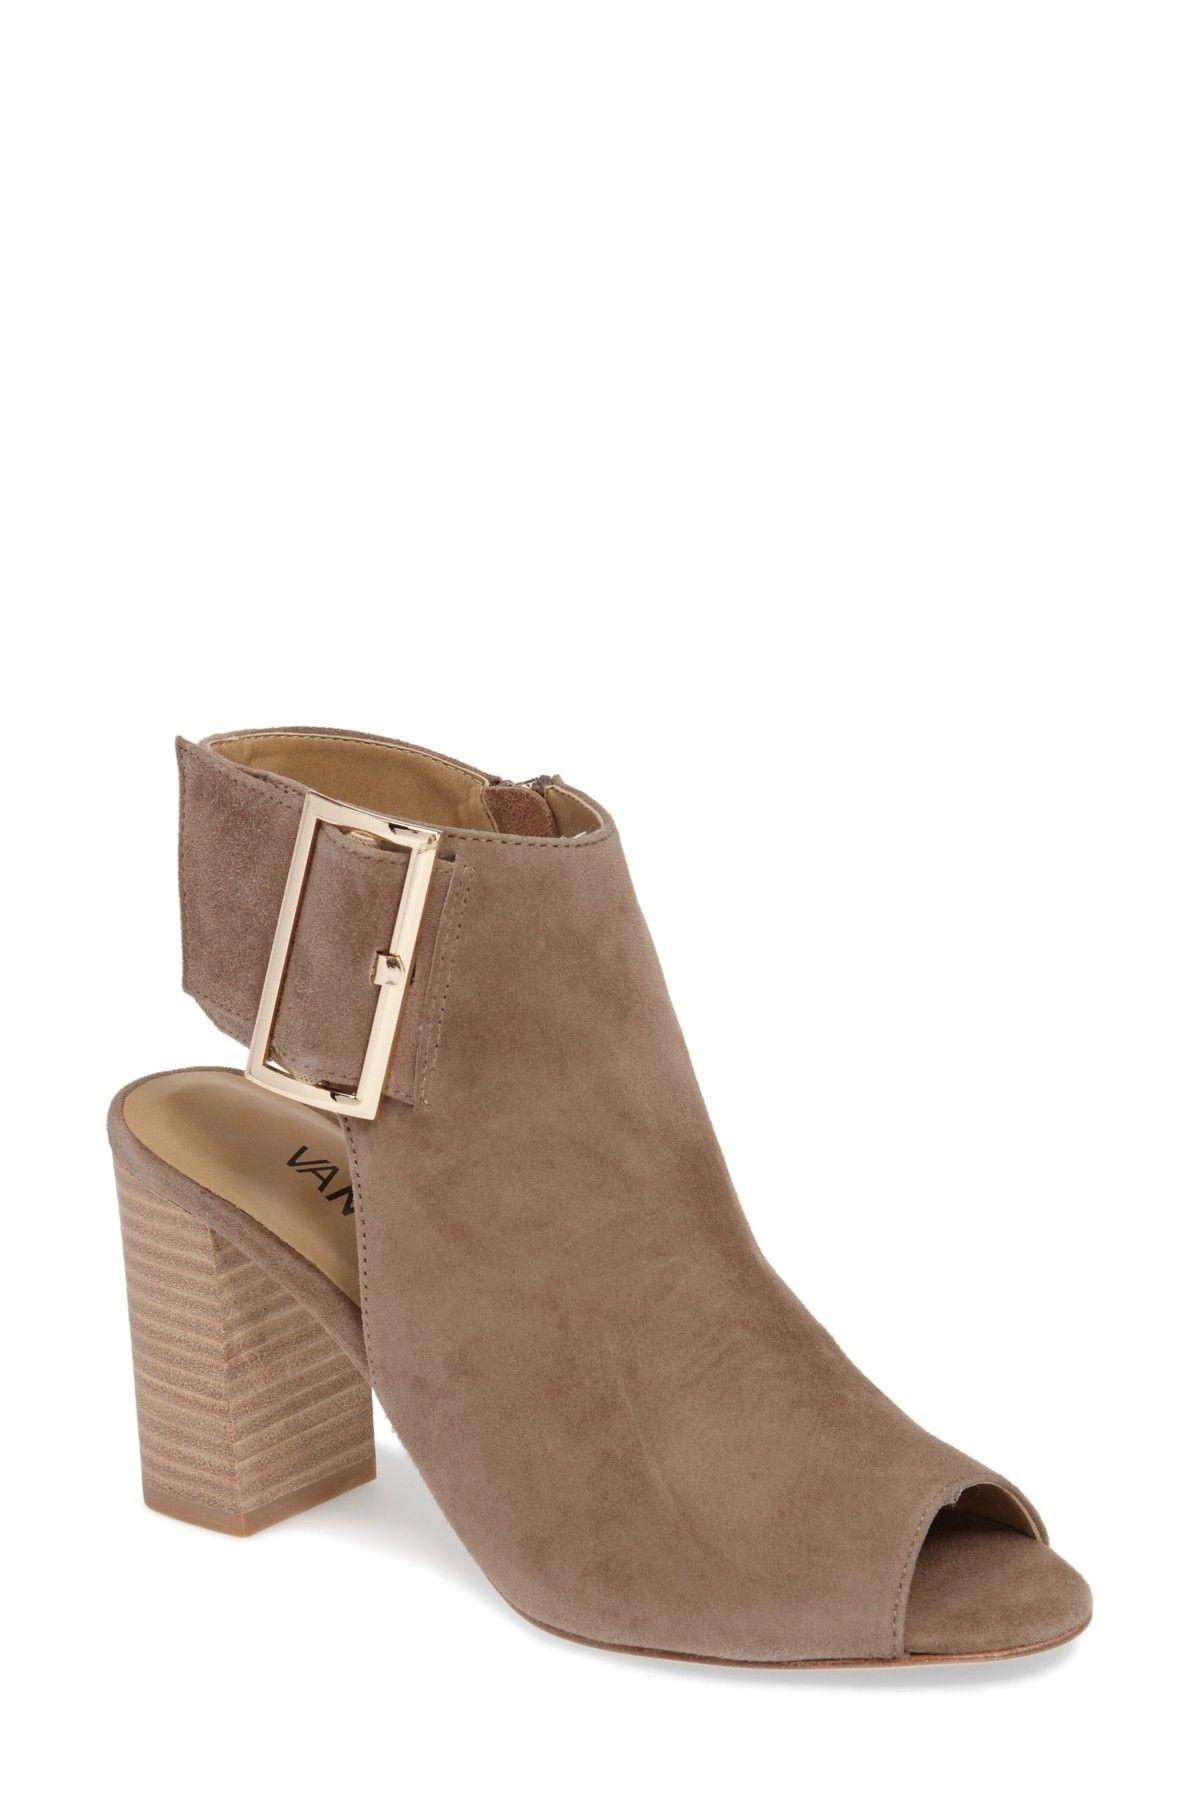 5bce6e0577e Bisa  Peep Toe Slingback Sandal (Women)